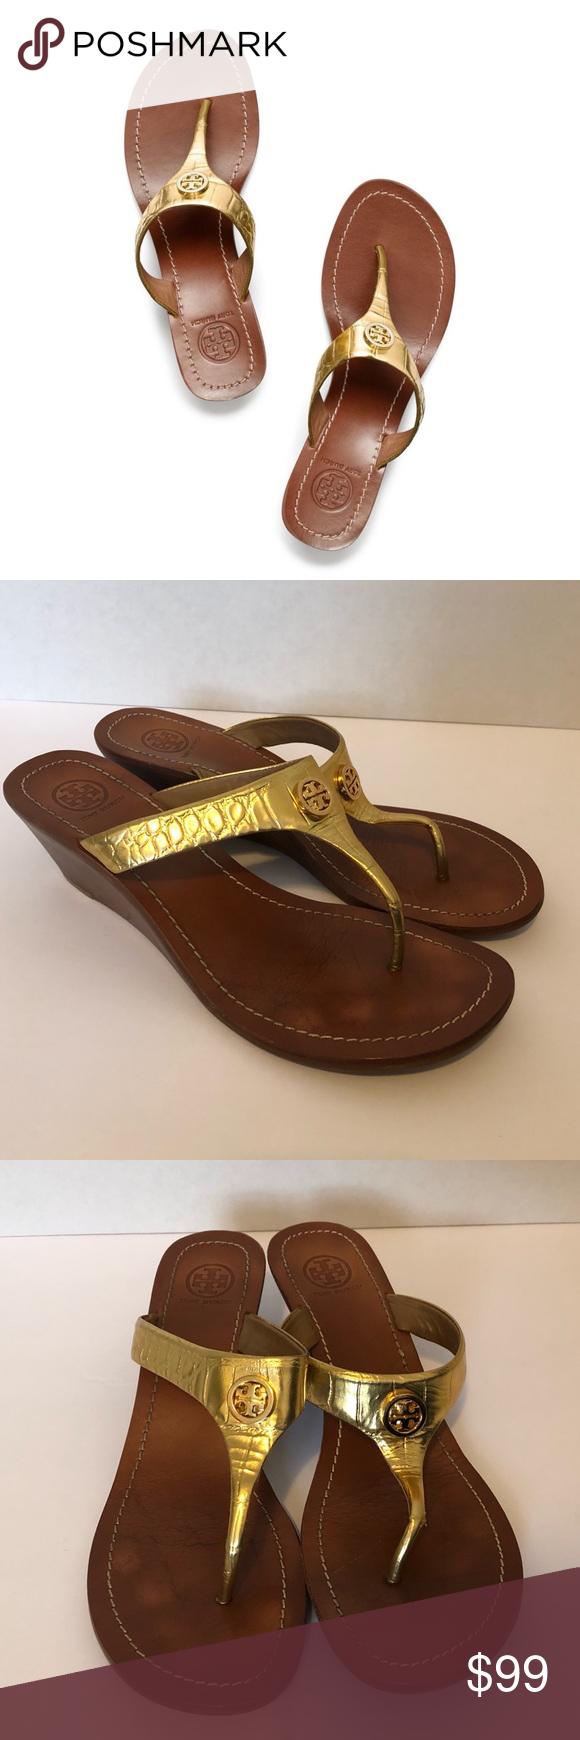 afa9013b0 Tory Burch Metallic Gold Wedge Thong Sandals EUC Tory Burch Cameron  Metallic Thong Wedge Sandals in